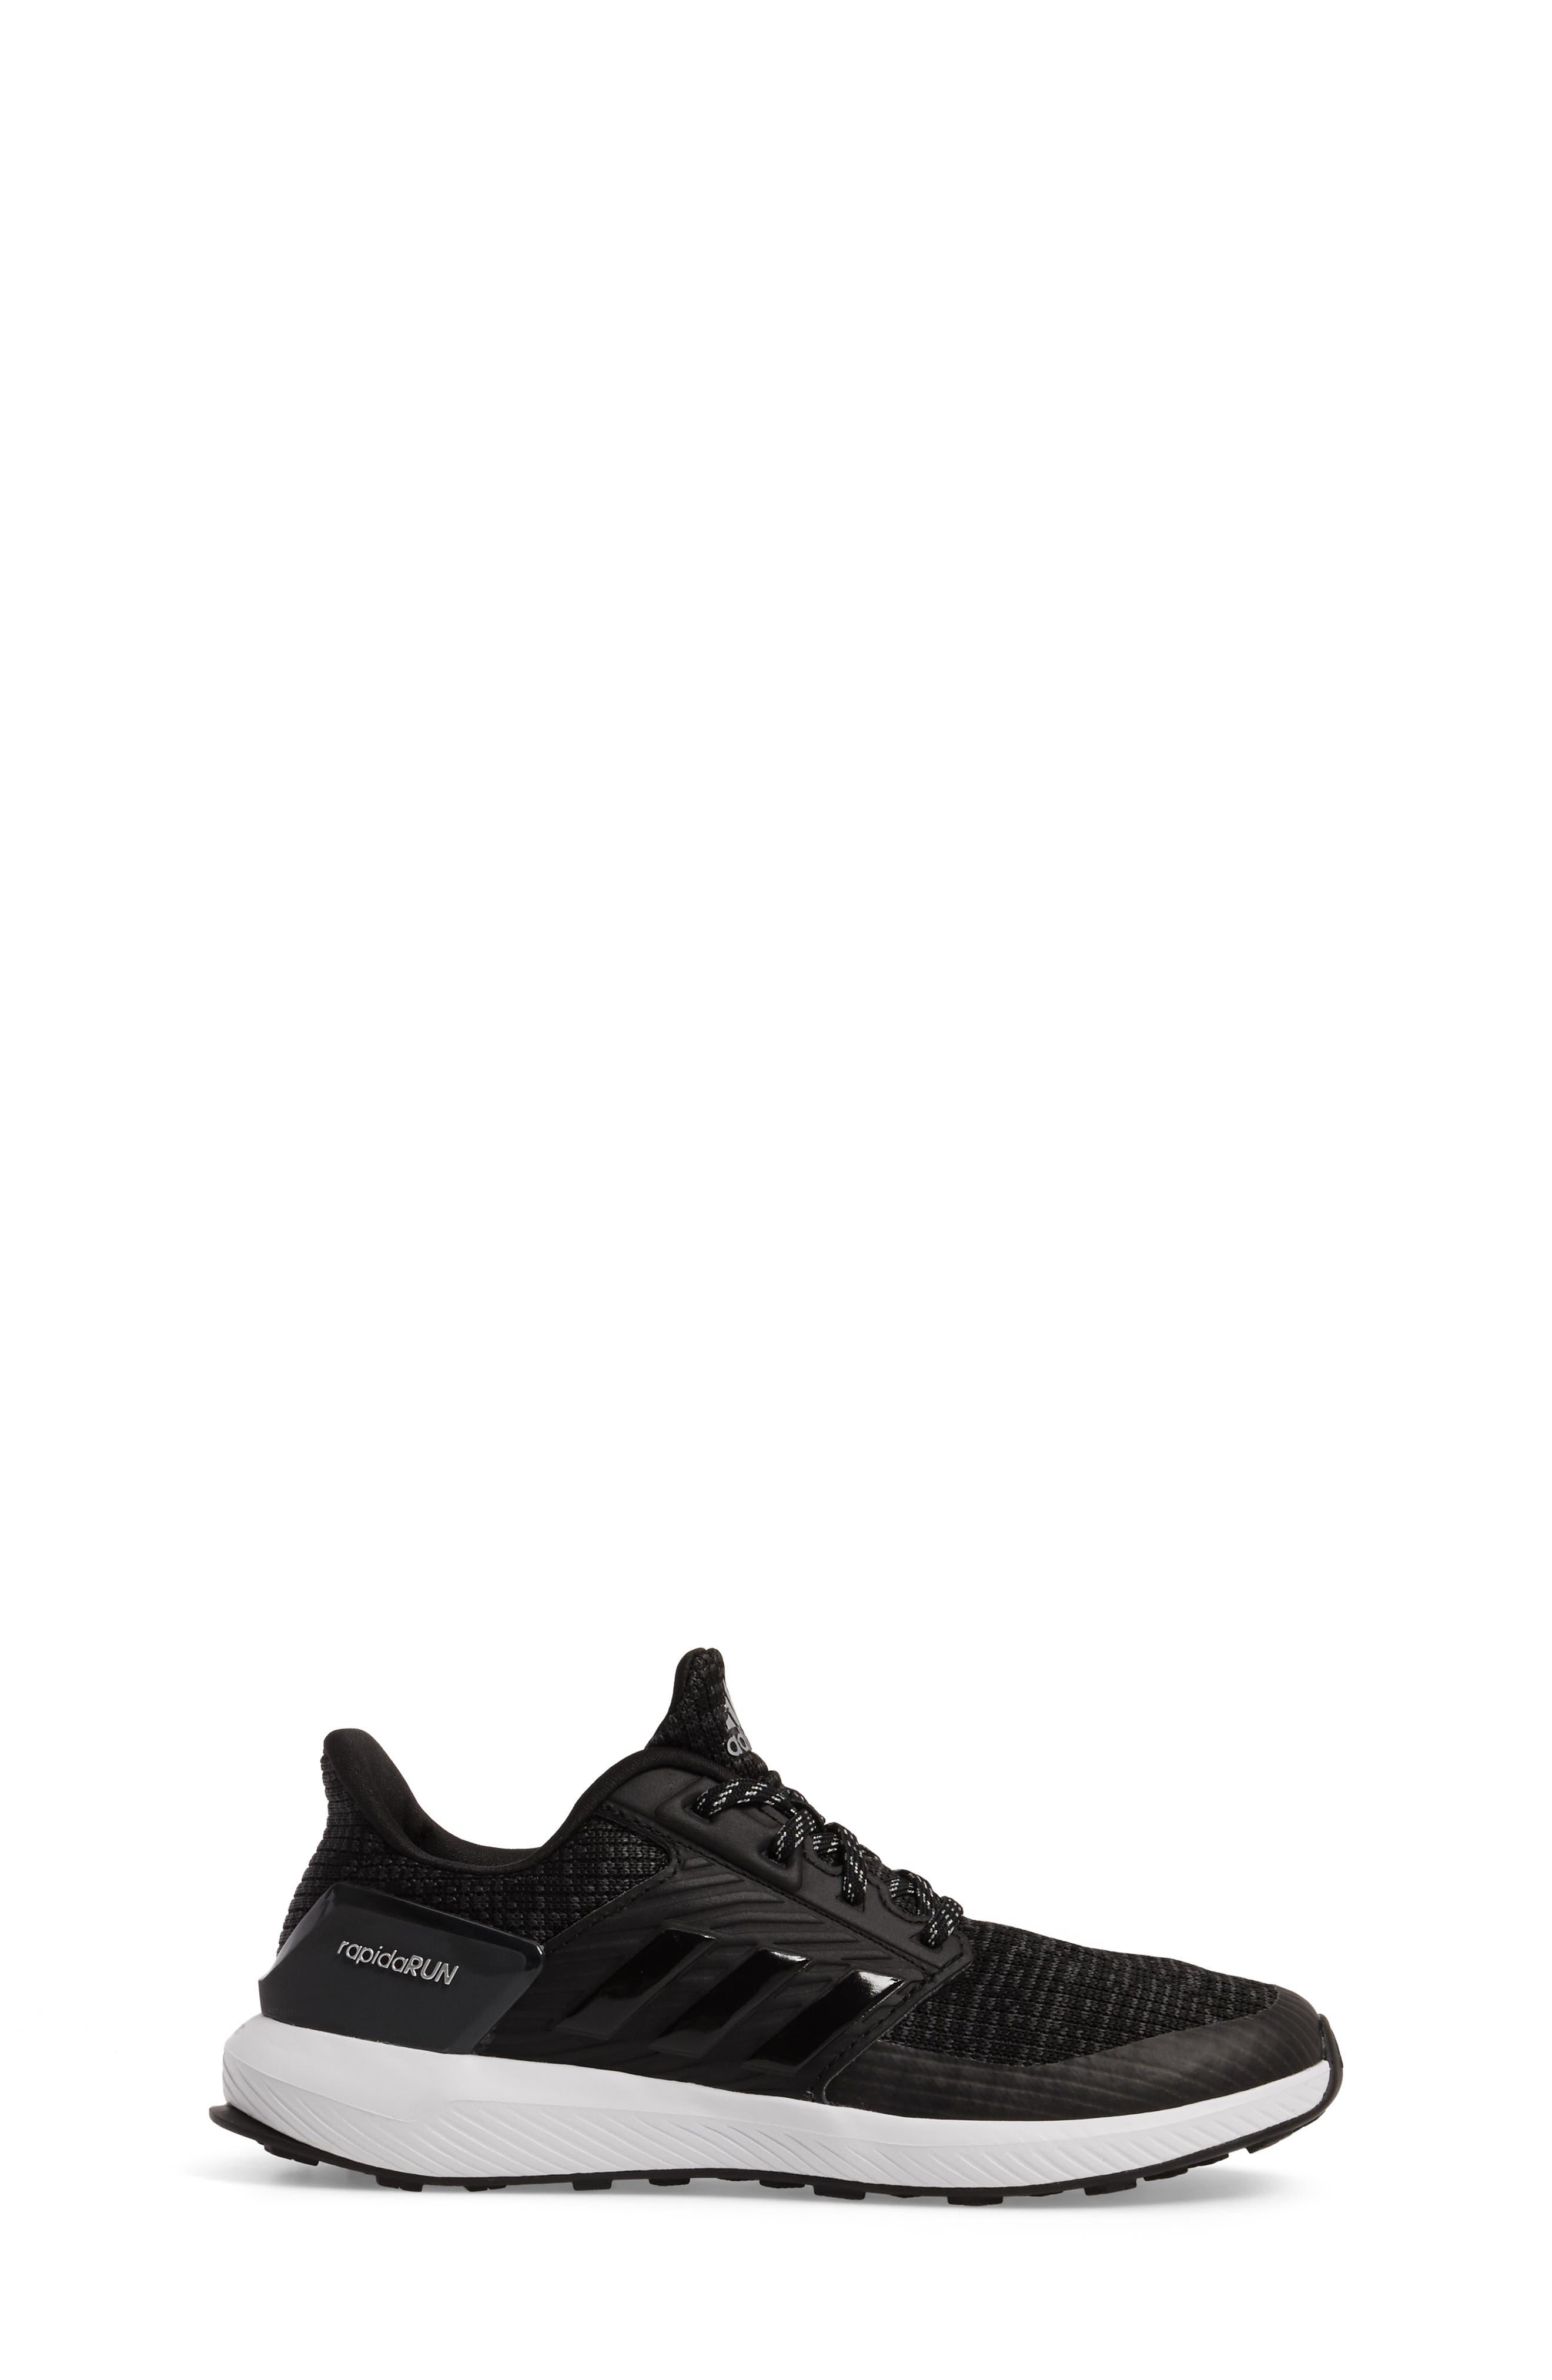 RapidaRUN Lux Sneaker,                             Alternate thumbnail 3, color,                             001